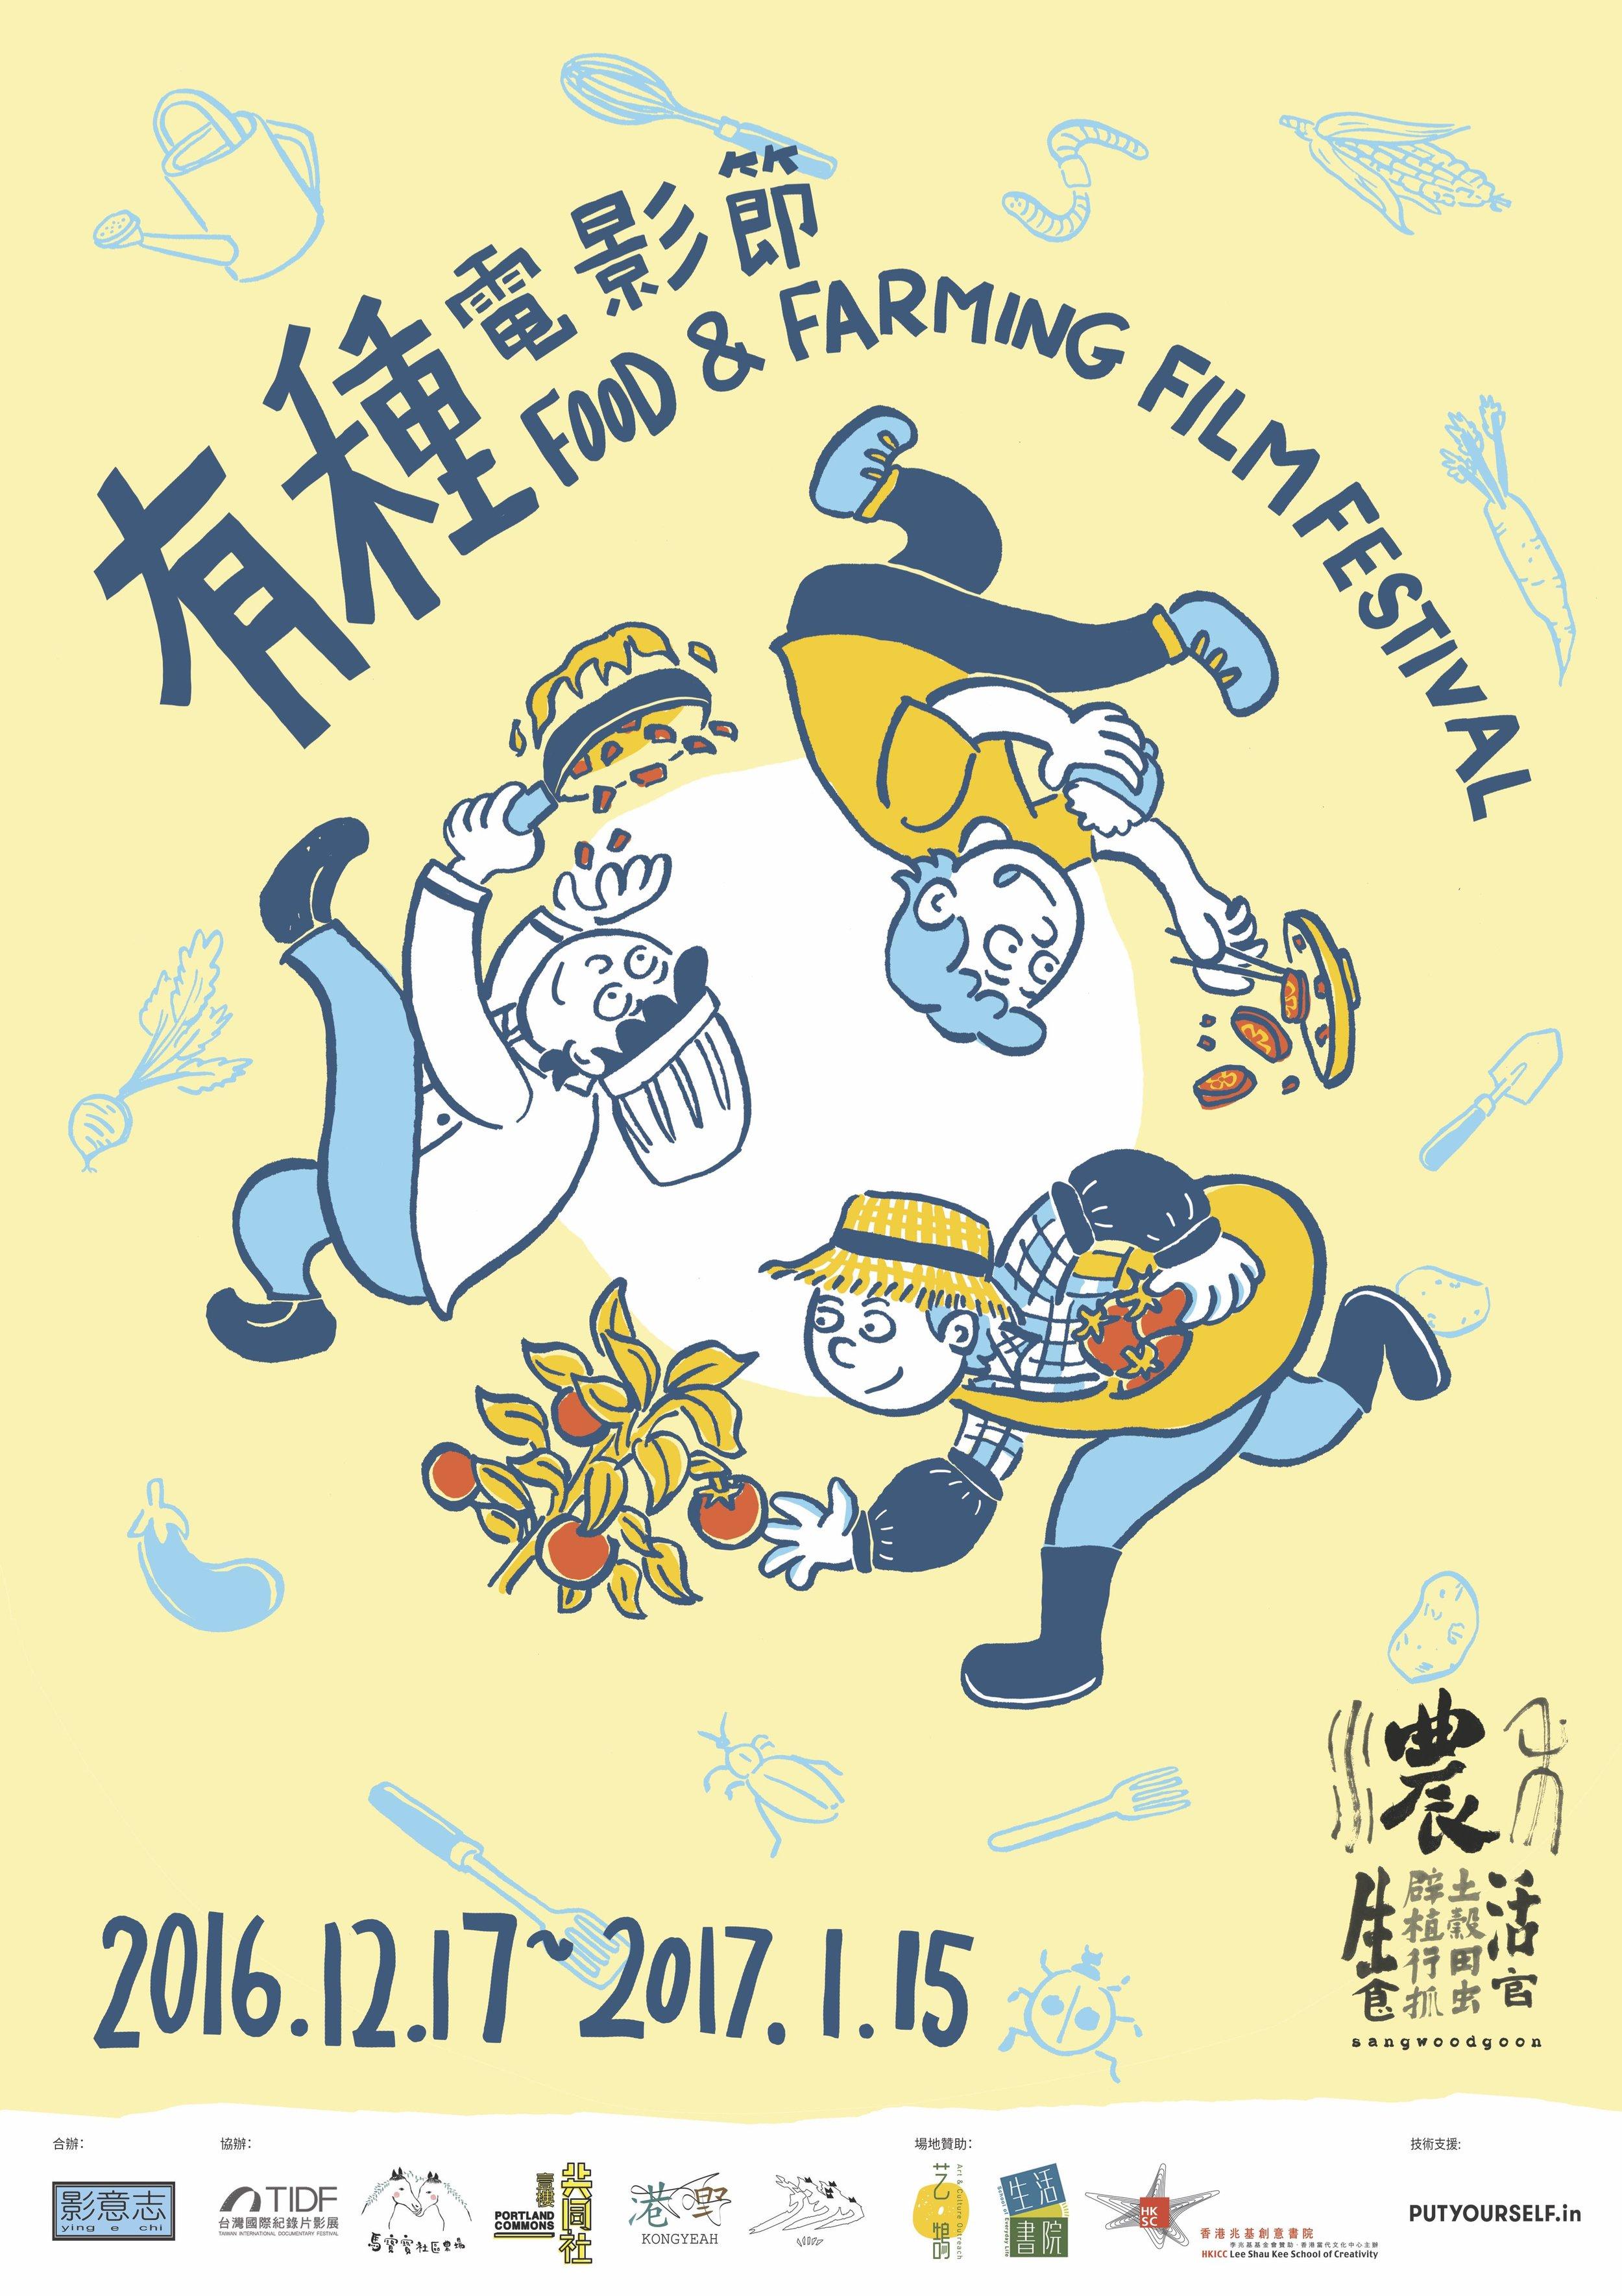 poster for Food & Farming Film Festival 2017